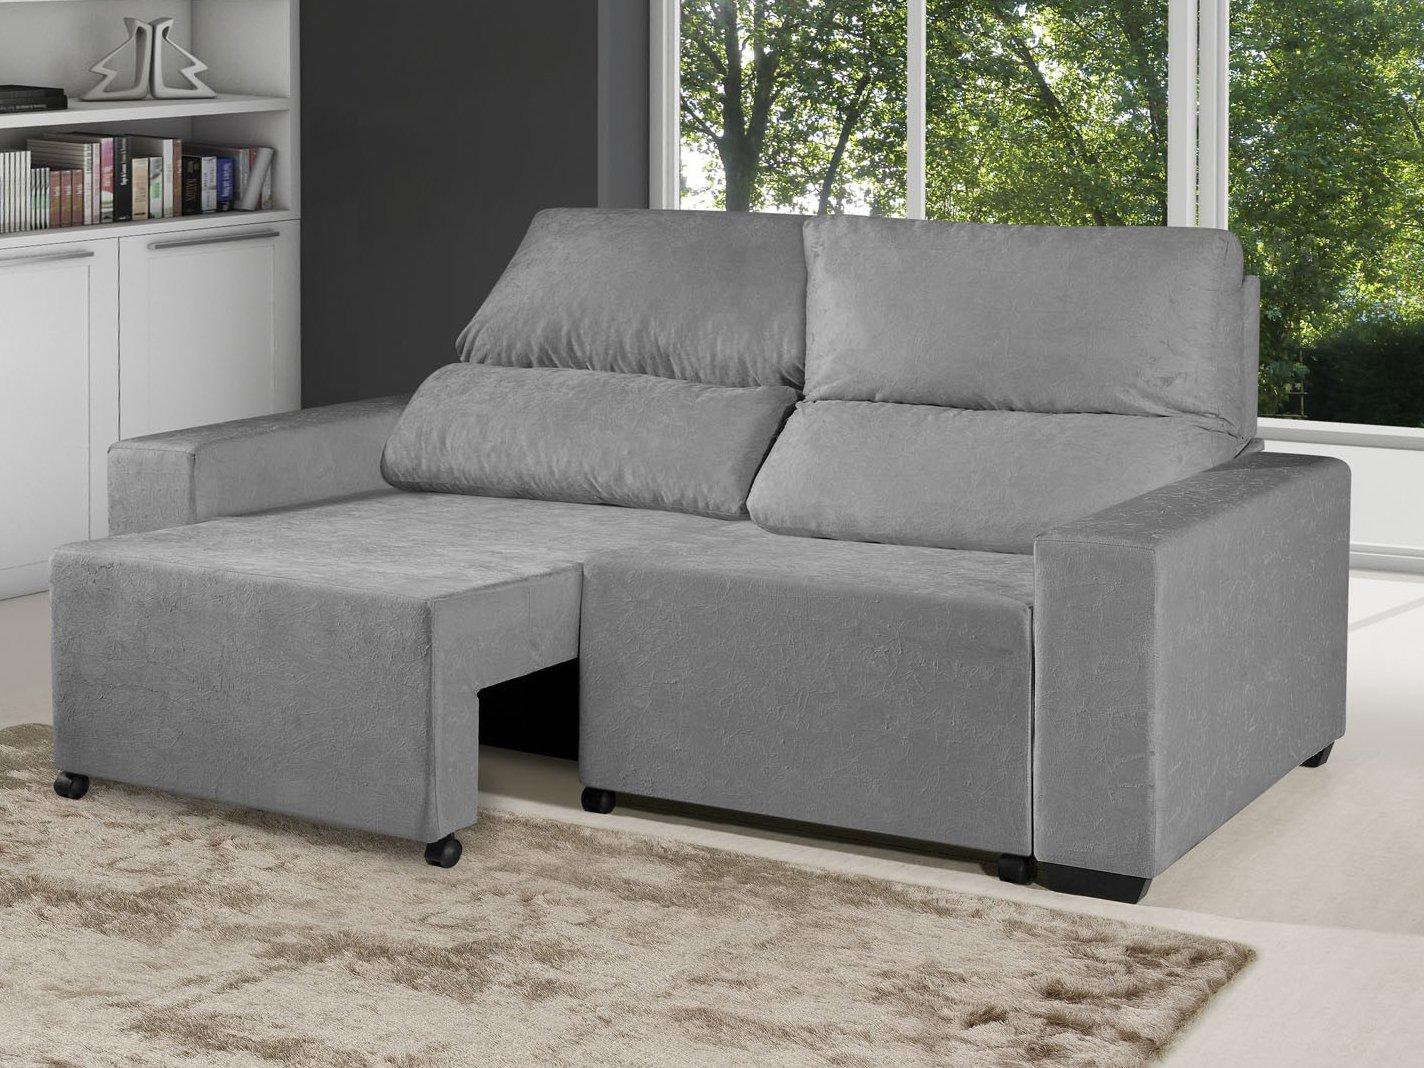 Foto 1 - Sofá Retrátil Reclinável 3 Lugares Suede Elegance - American Comfort